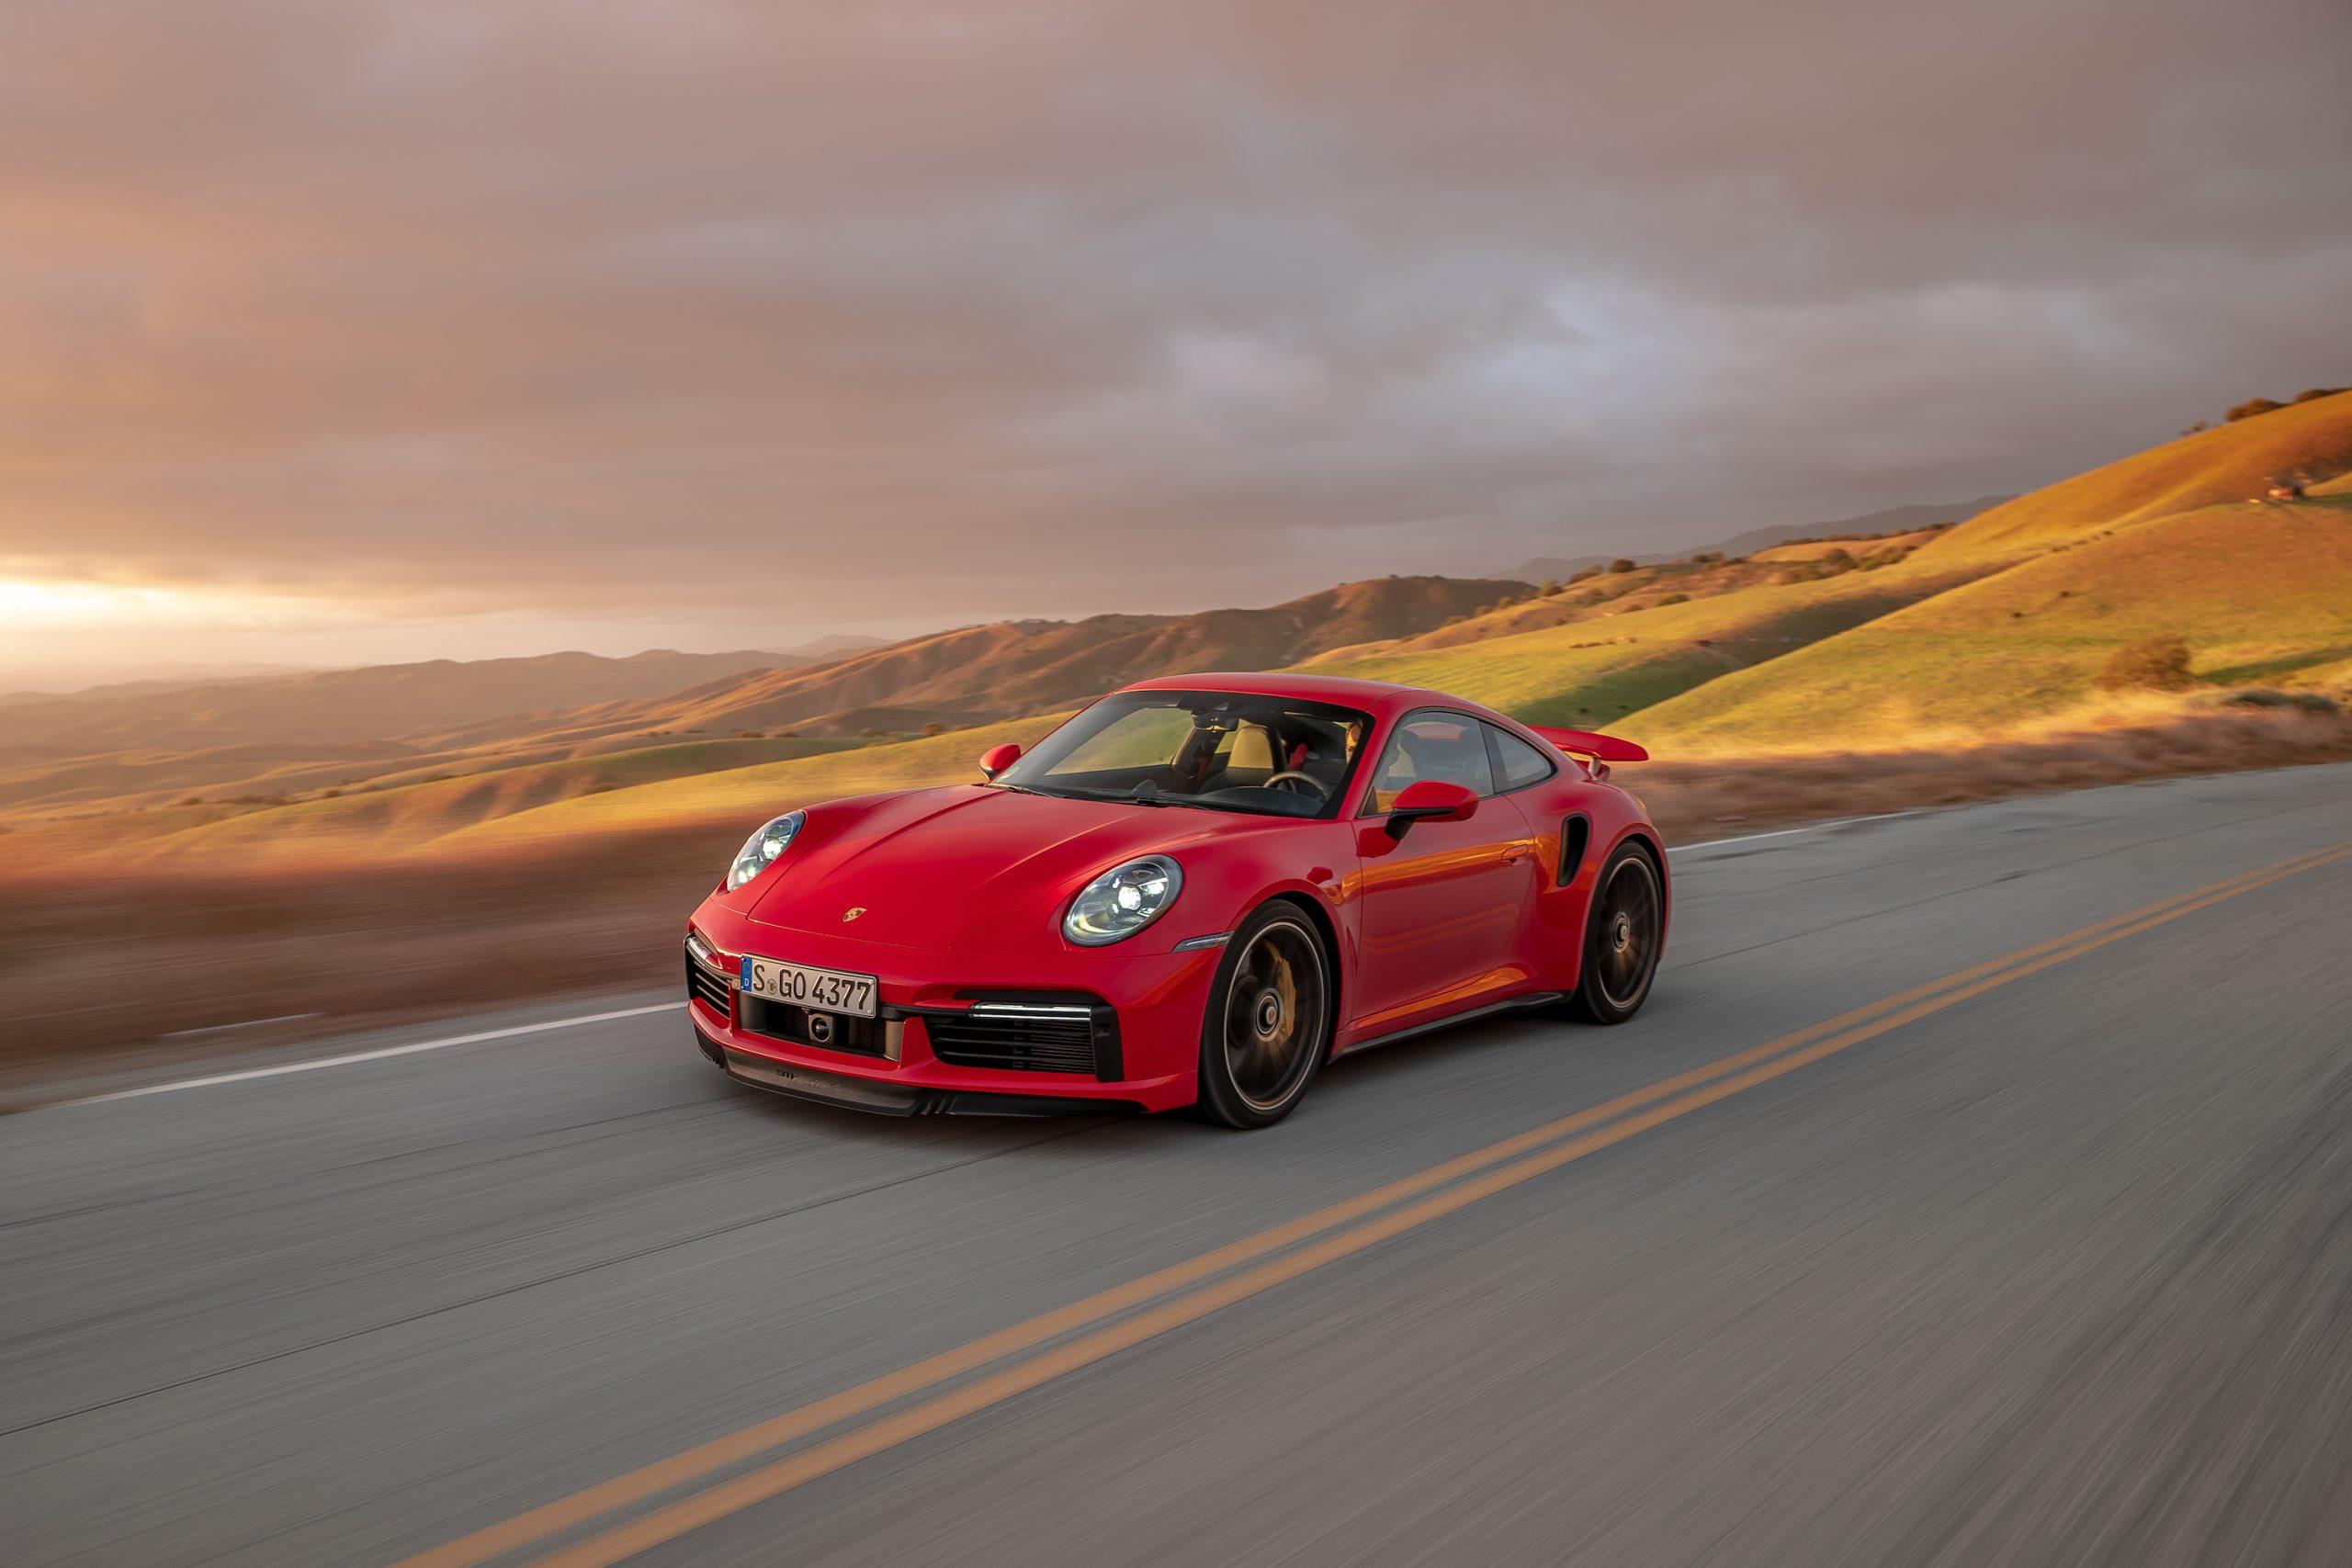 2021 Porsche 911 Turbo S Front Three-Quarter Sun On Hills